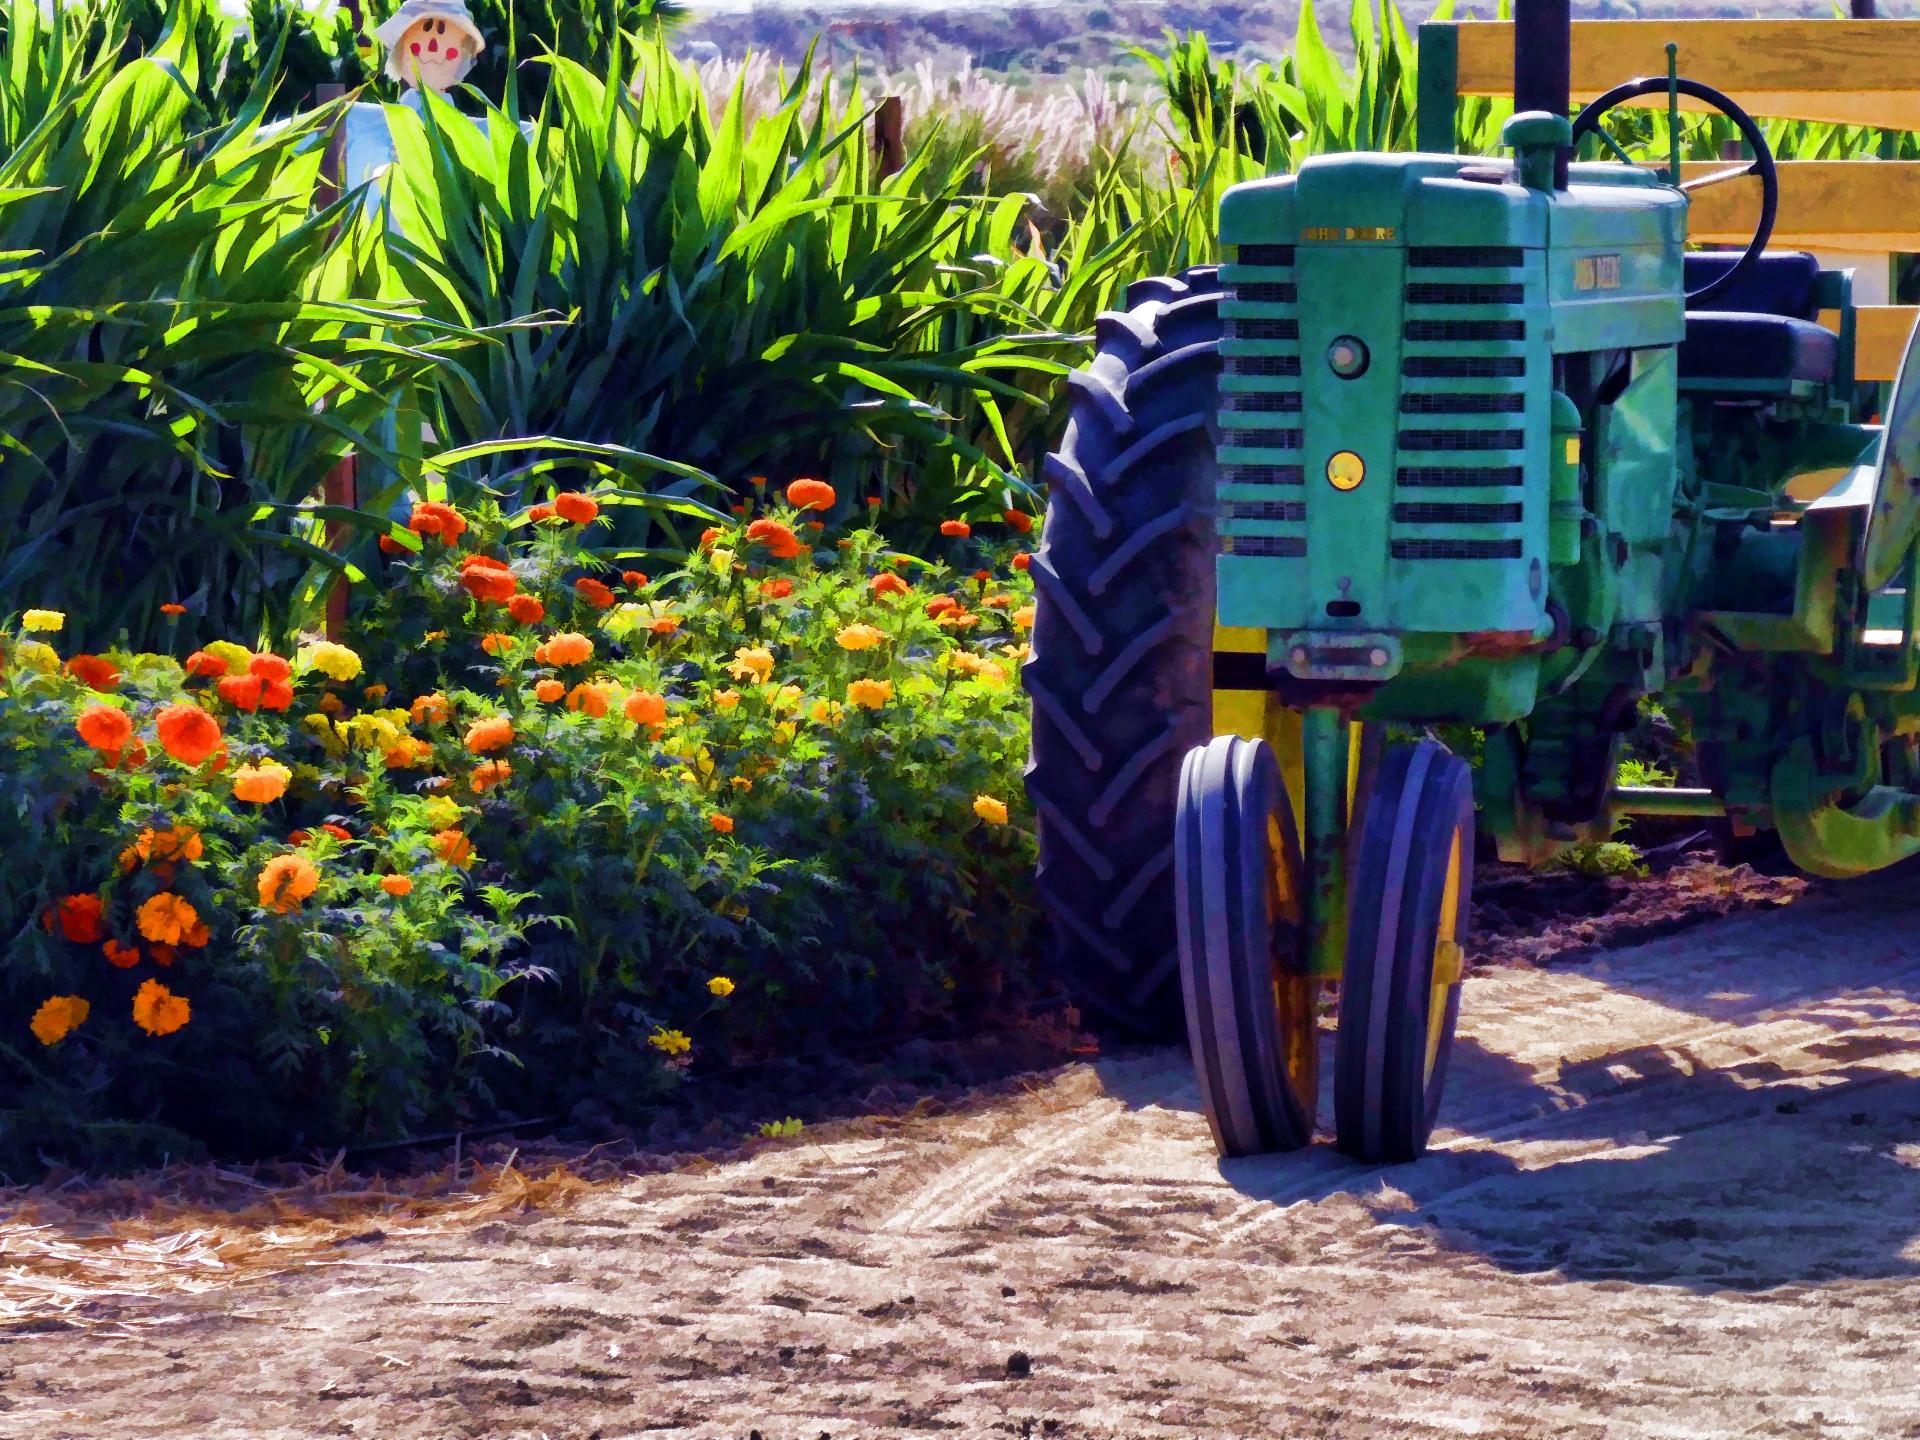 tractor-on-farm.jpg